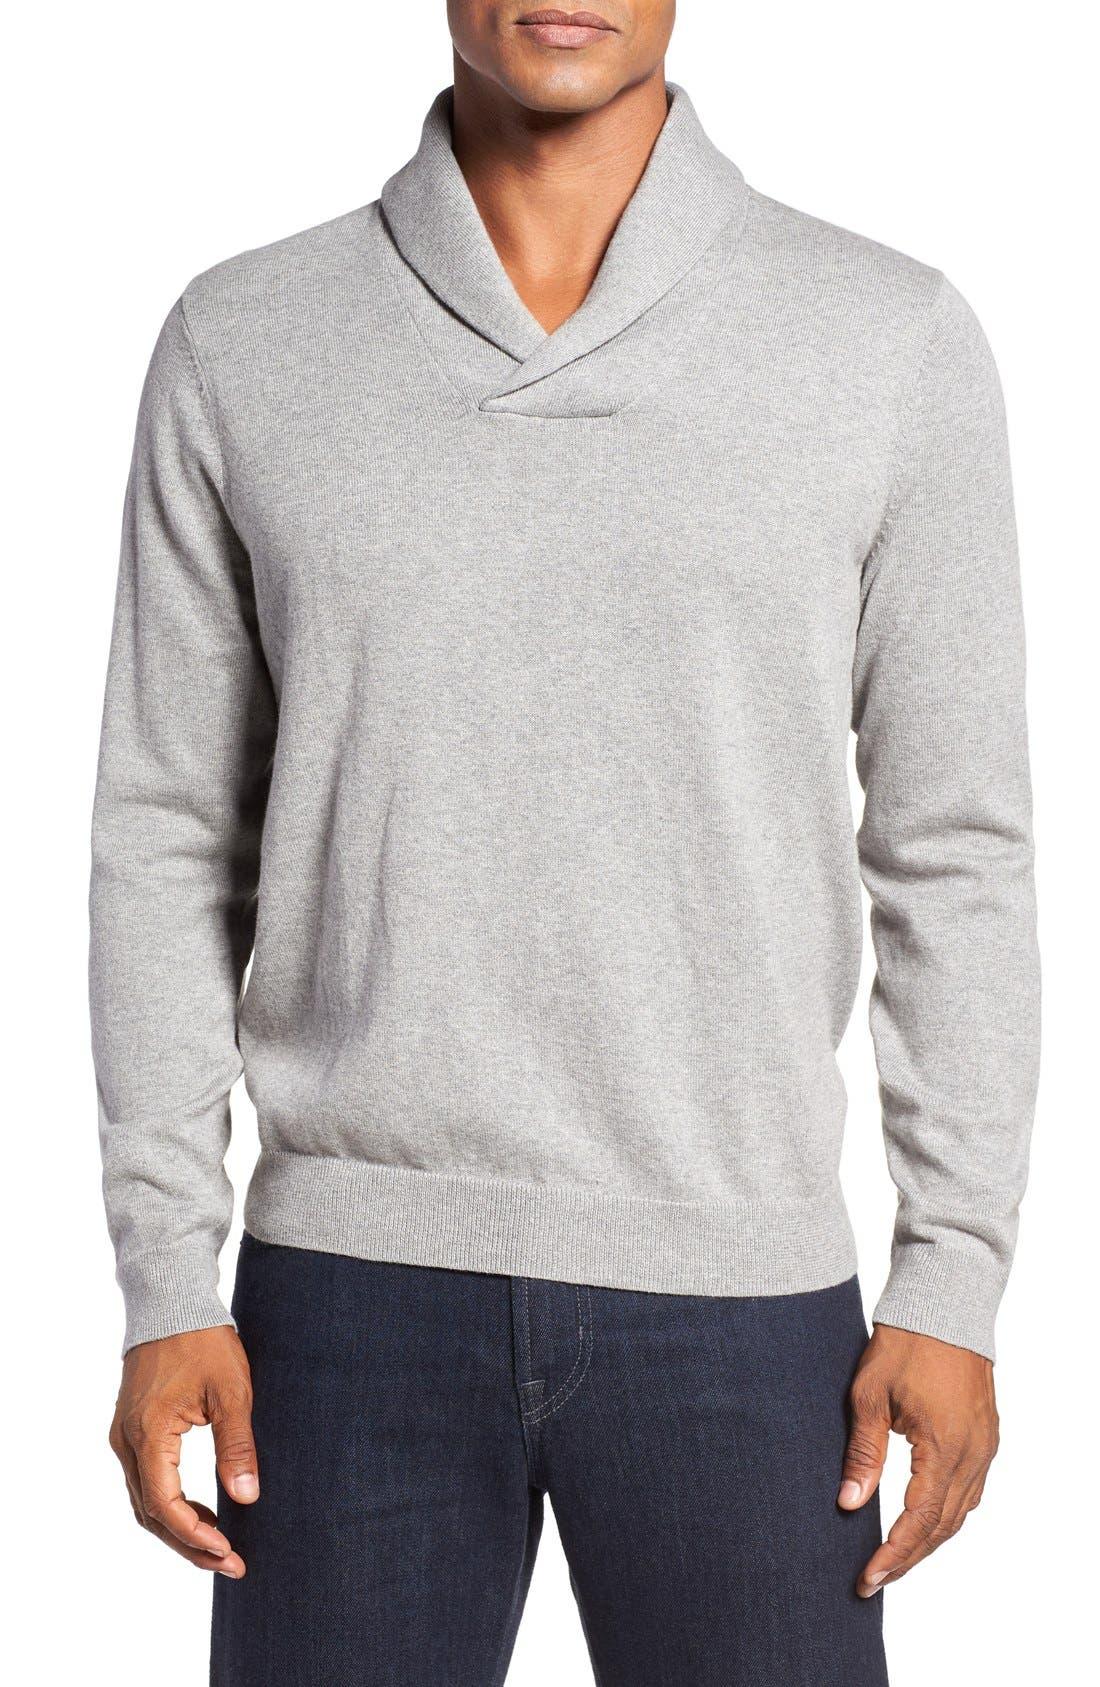 Main Image - Nordstrom Men's Shop Cotton & Cashmere Shawl Collar Sweater (Regular & Tall)